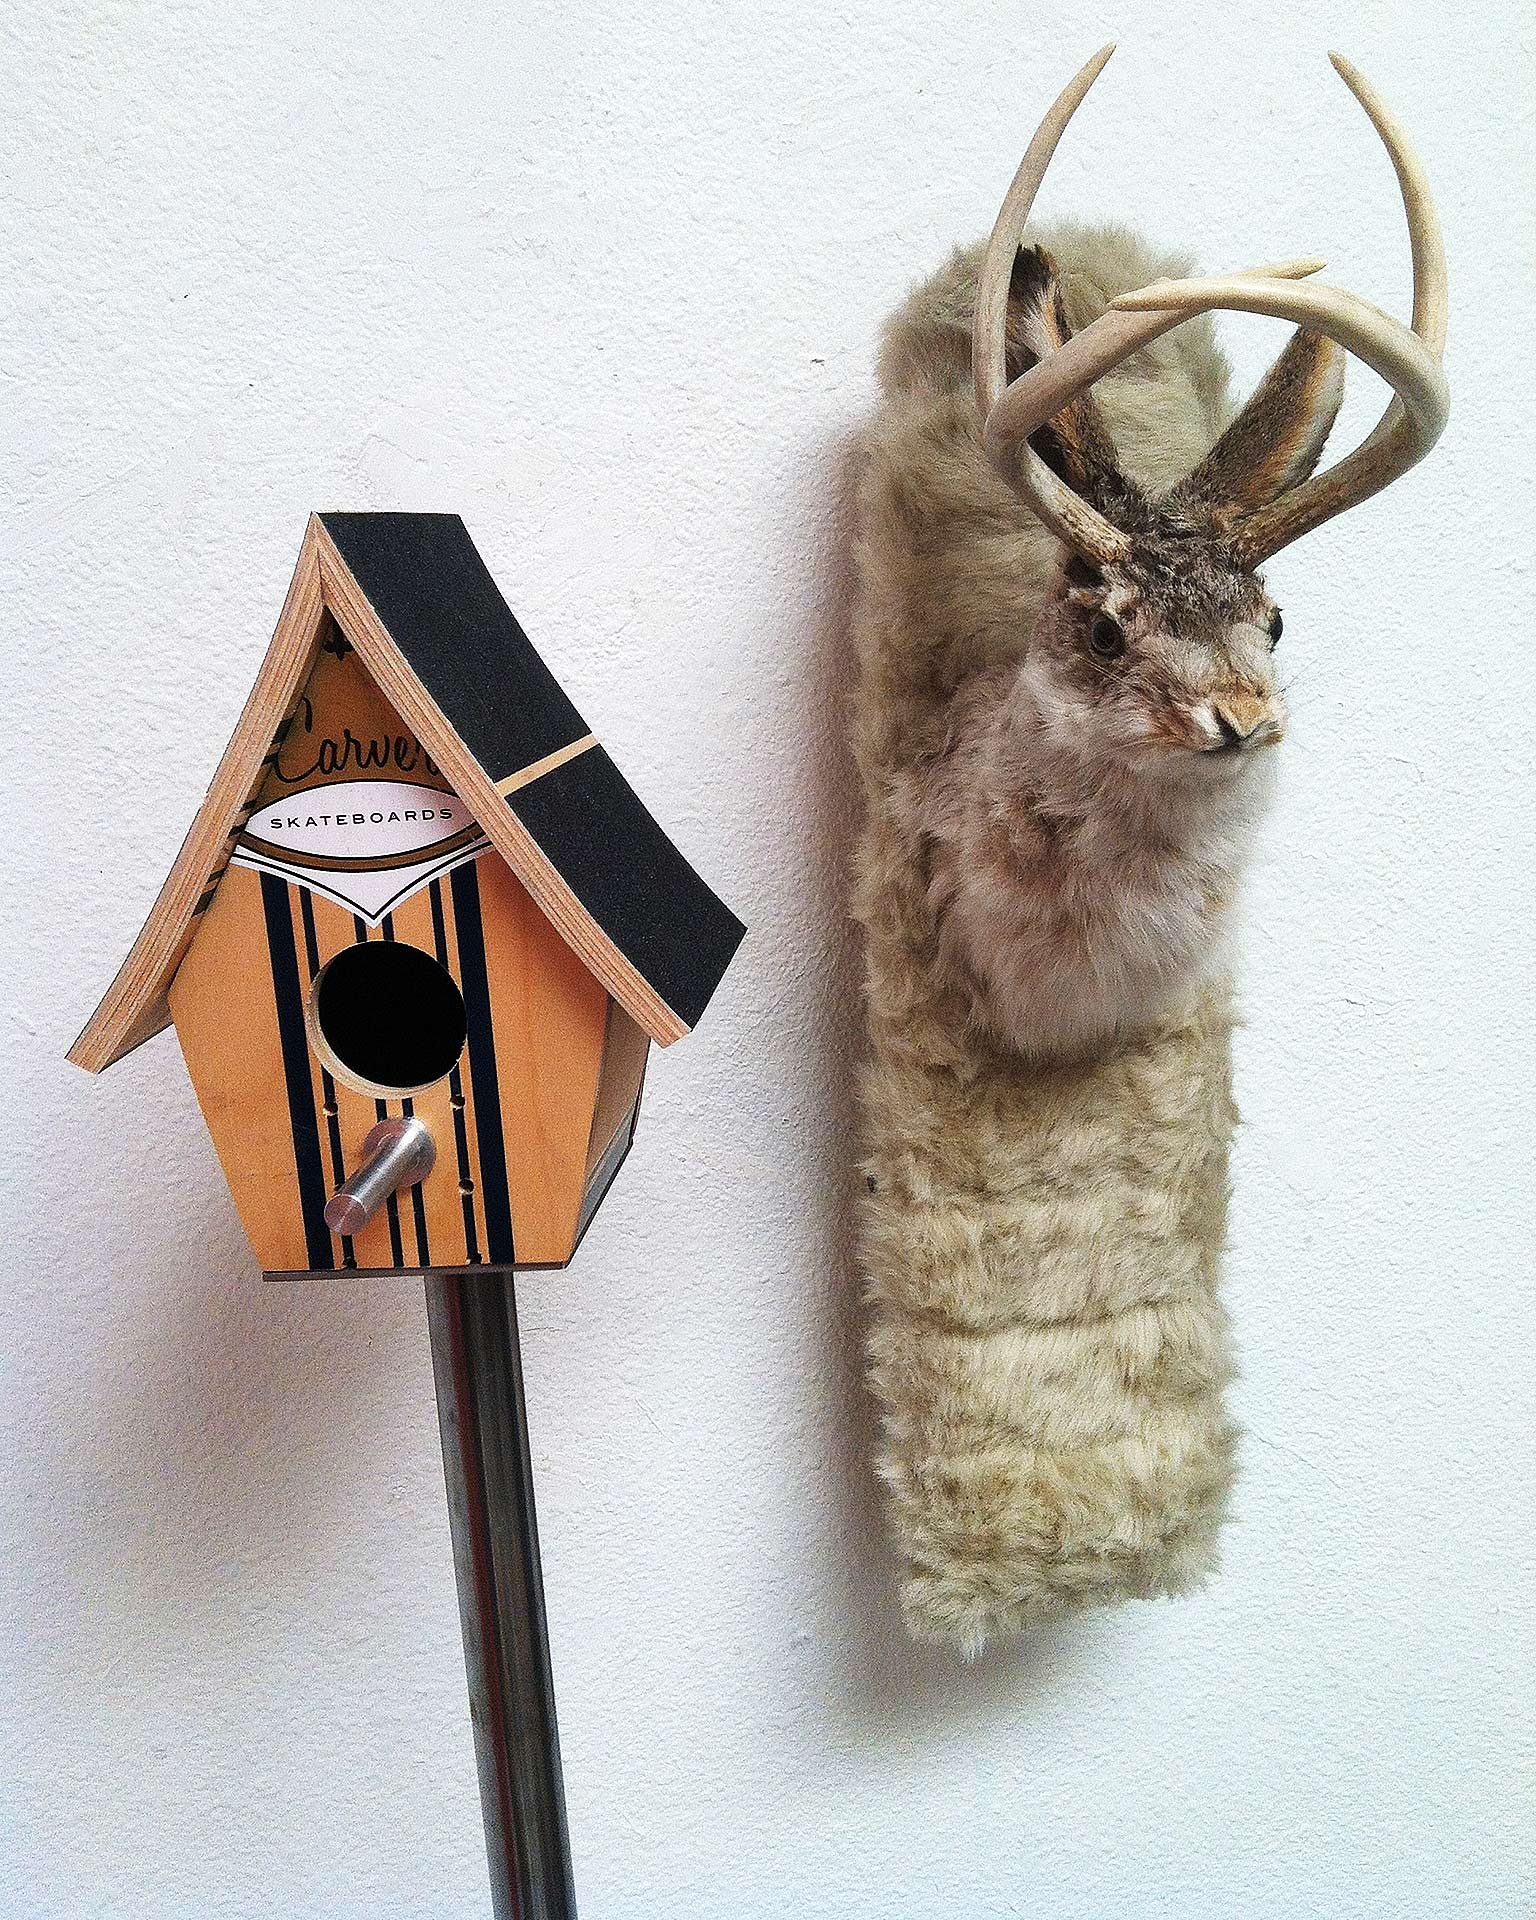 Birdhouses and Jackalopes